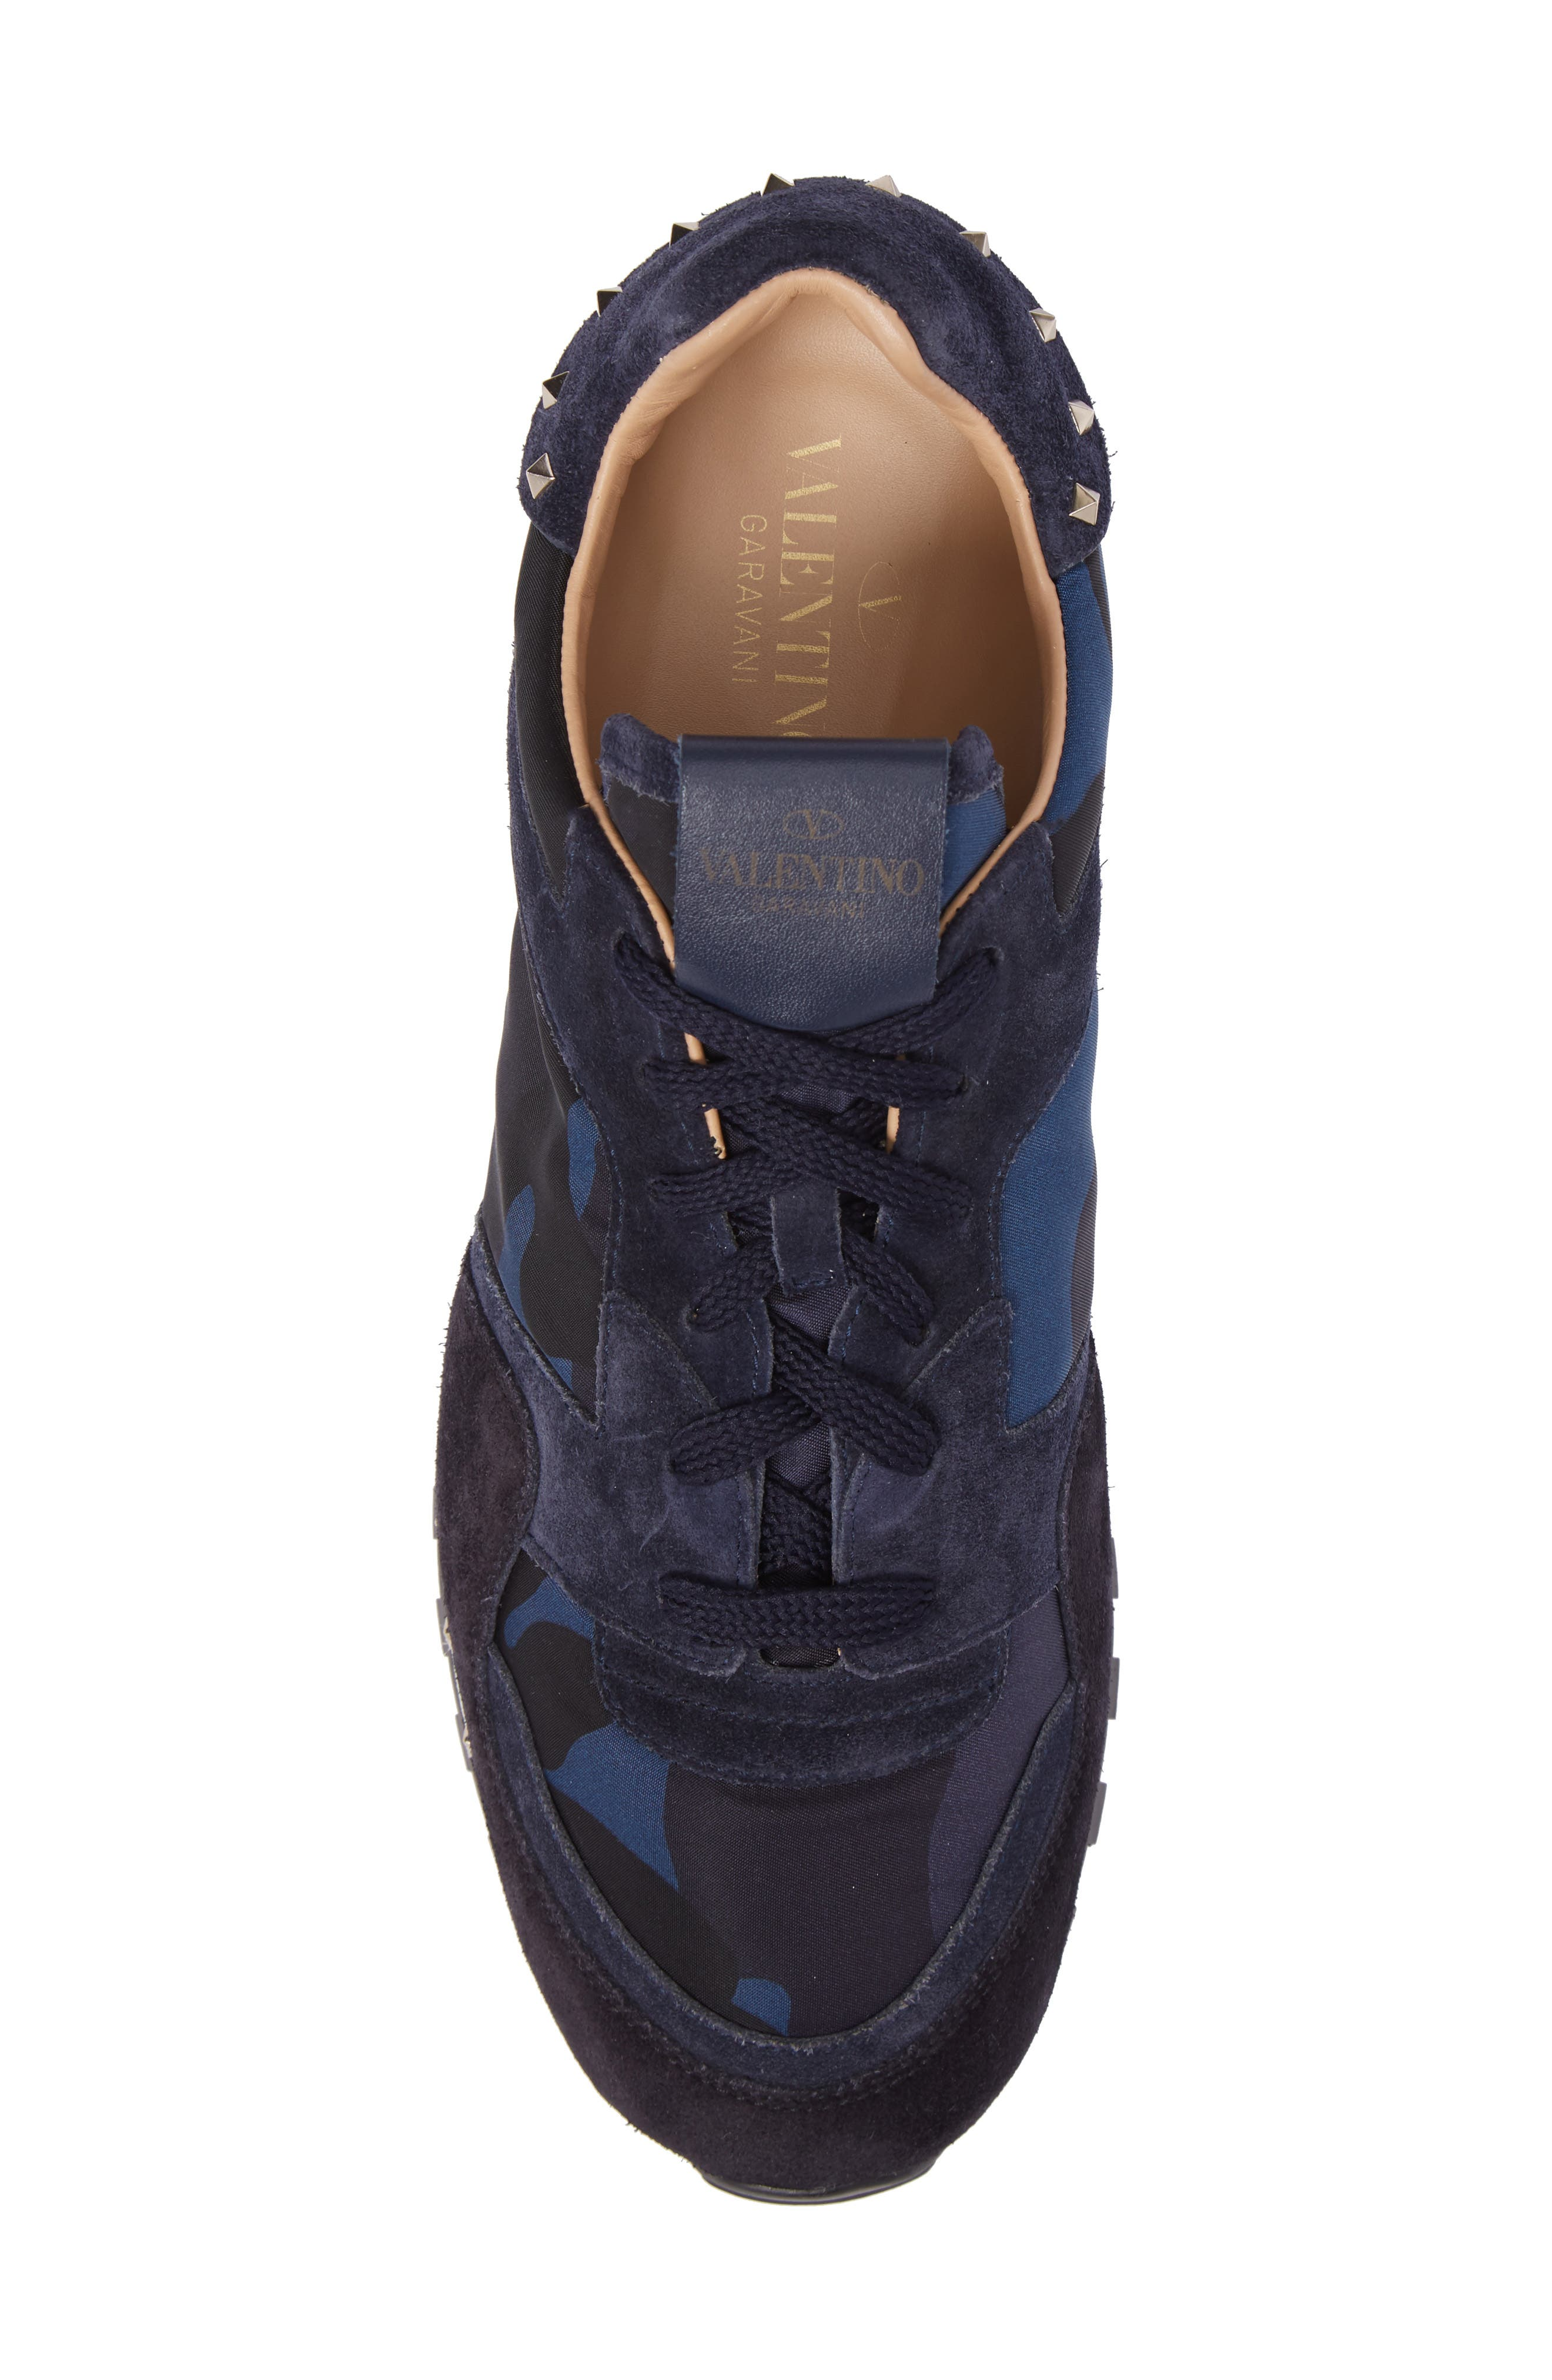 Camo Rockstud Sneaker,                             Alternate thumbnail 5, color,                             Marine/ Nero/ Dark Blue